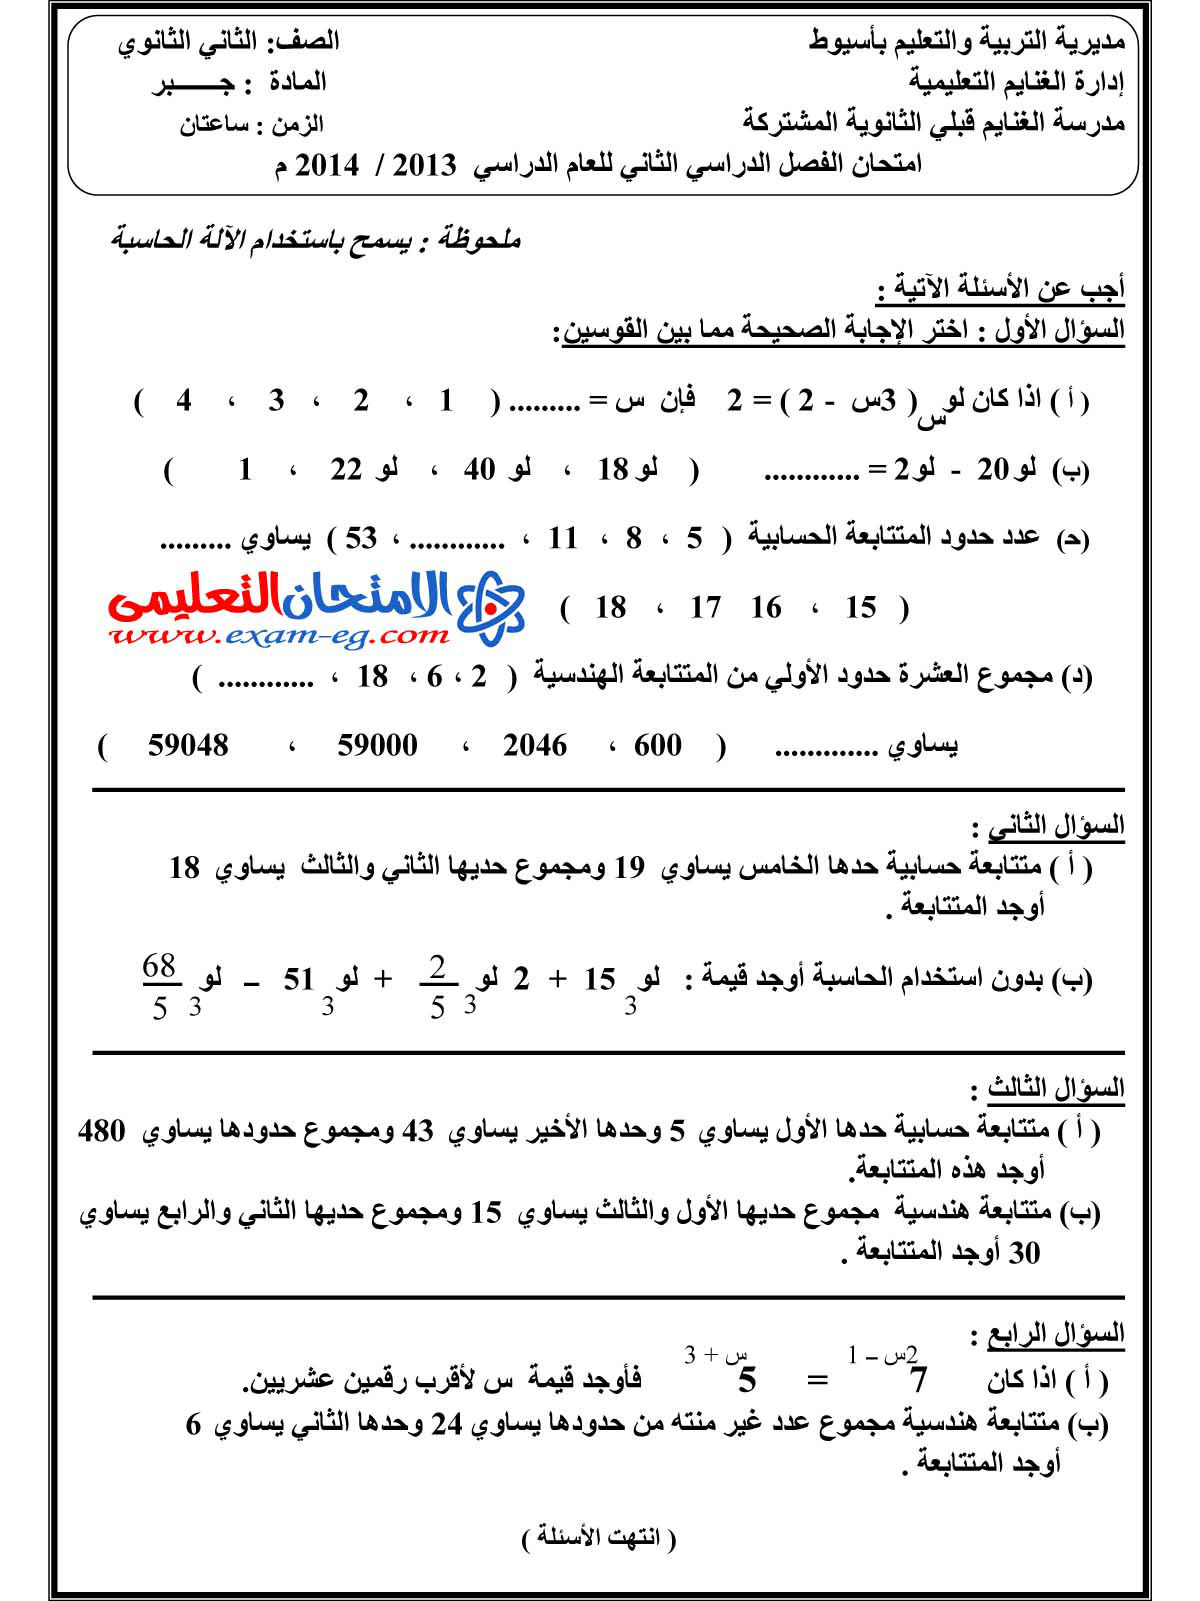 exam-eg.com_1399962270521.jpg